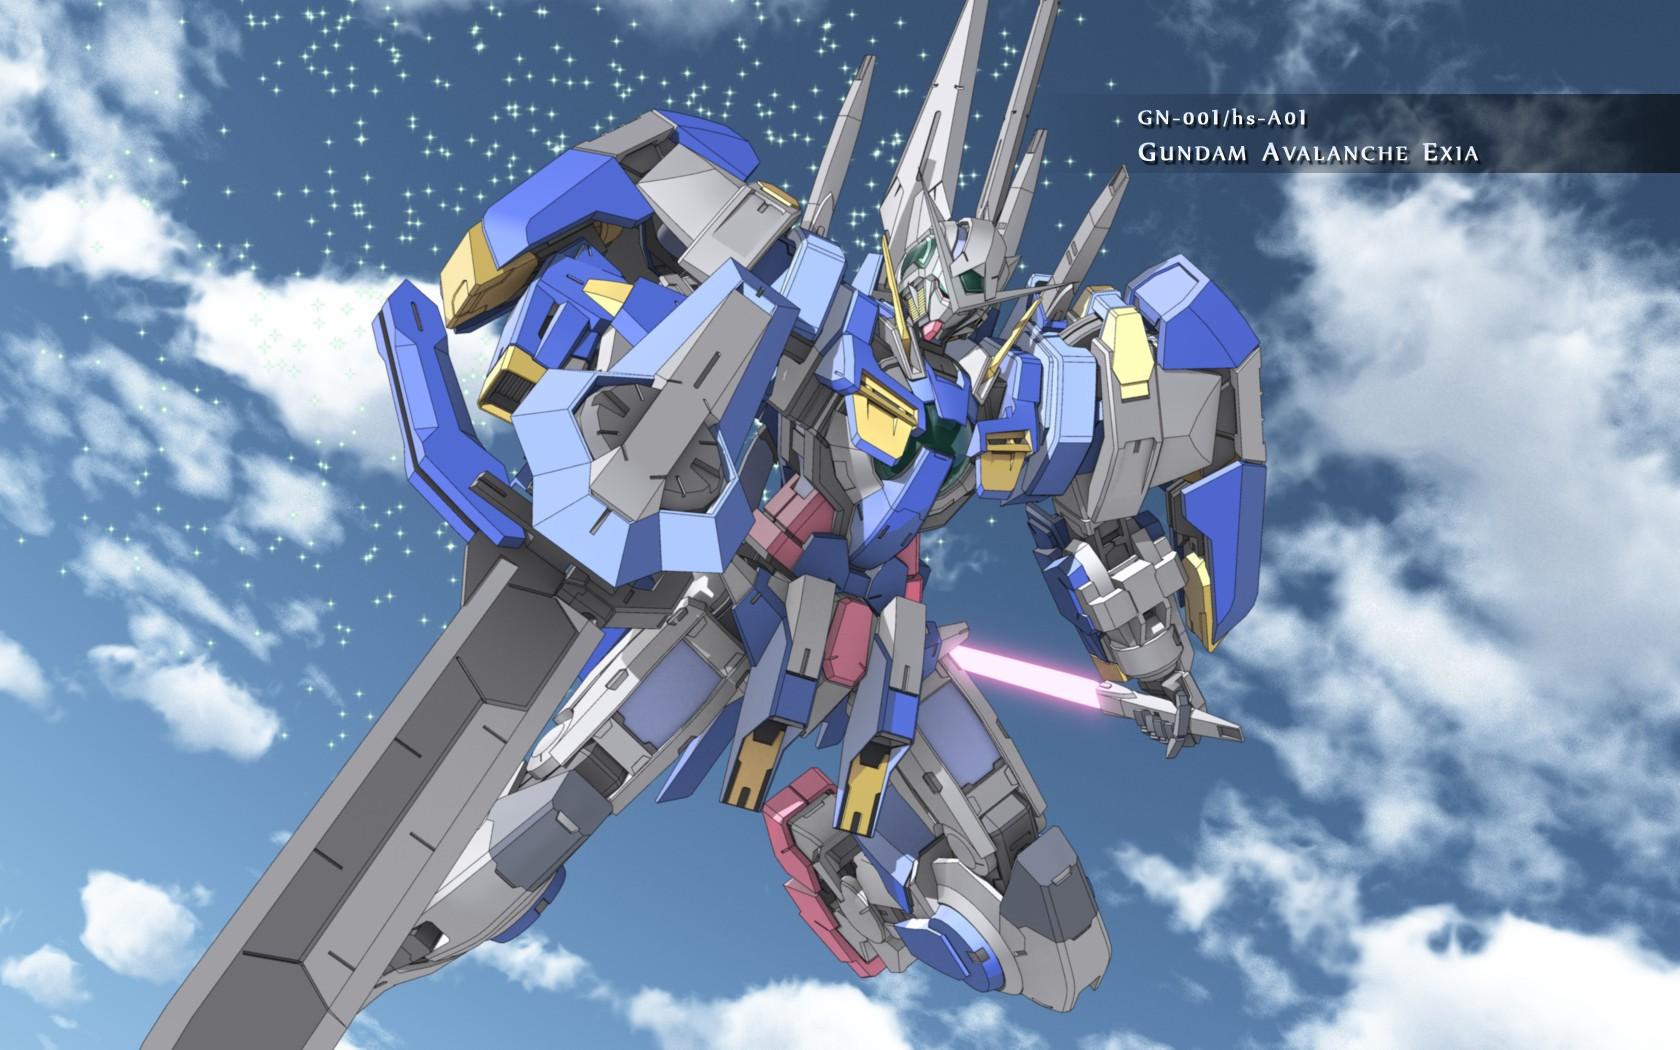 Image   Gundam Avalanche Exia Sky Wallpaper Widejpg   Gundam Wiki 1680x1050